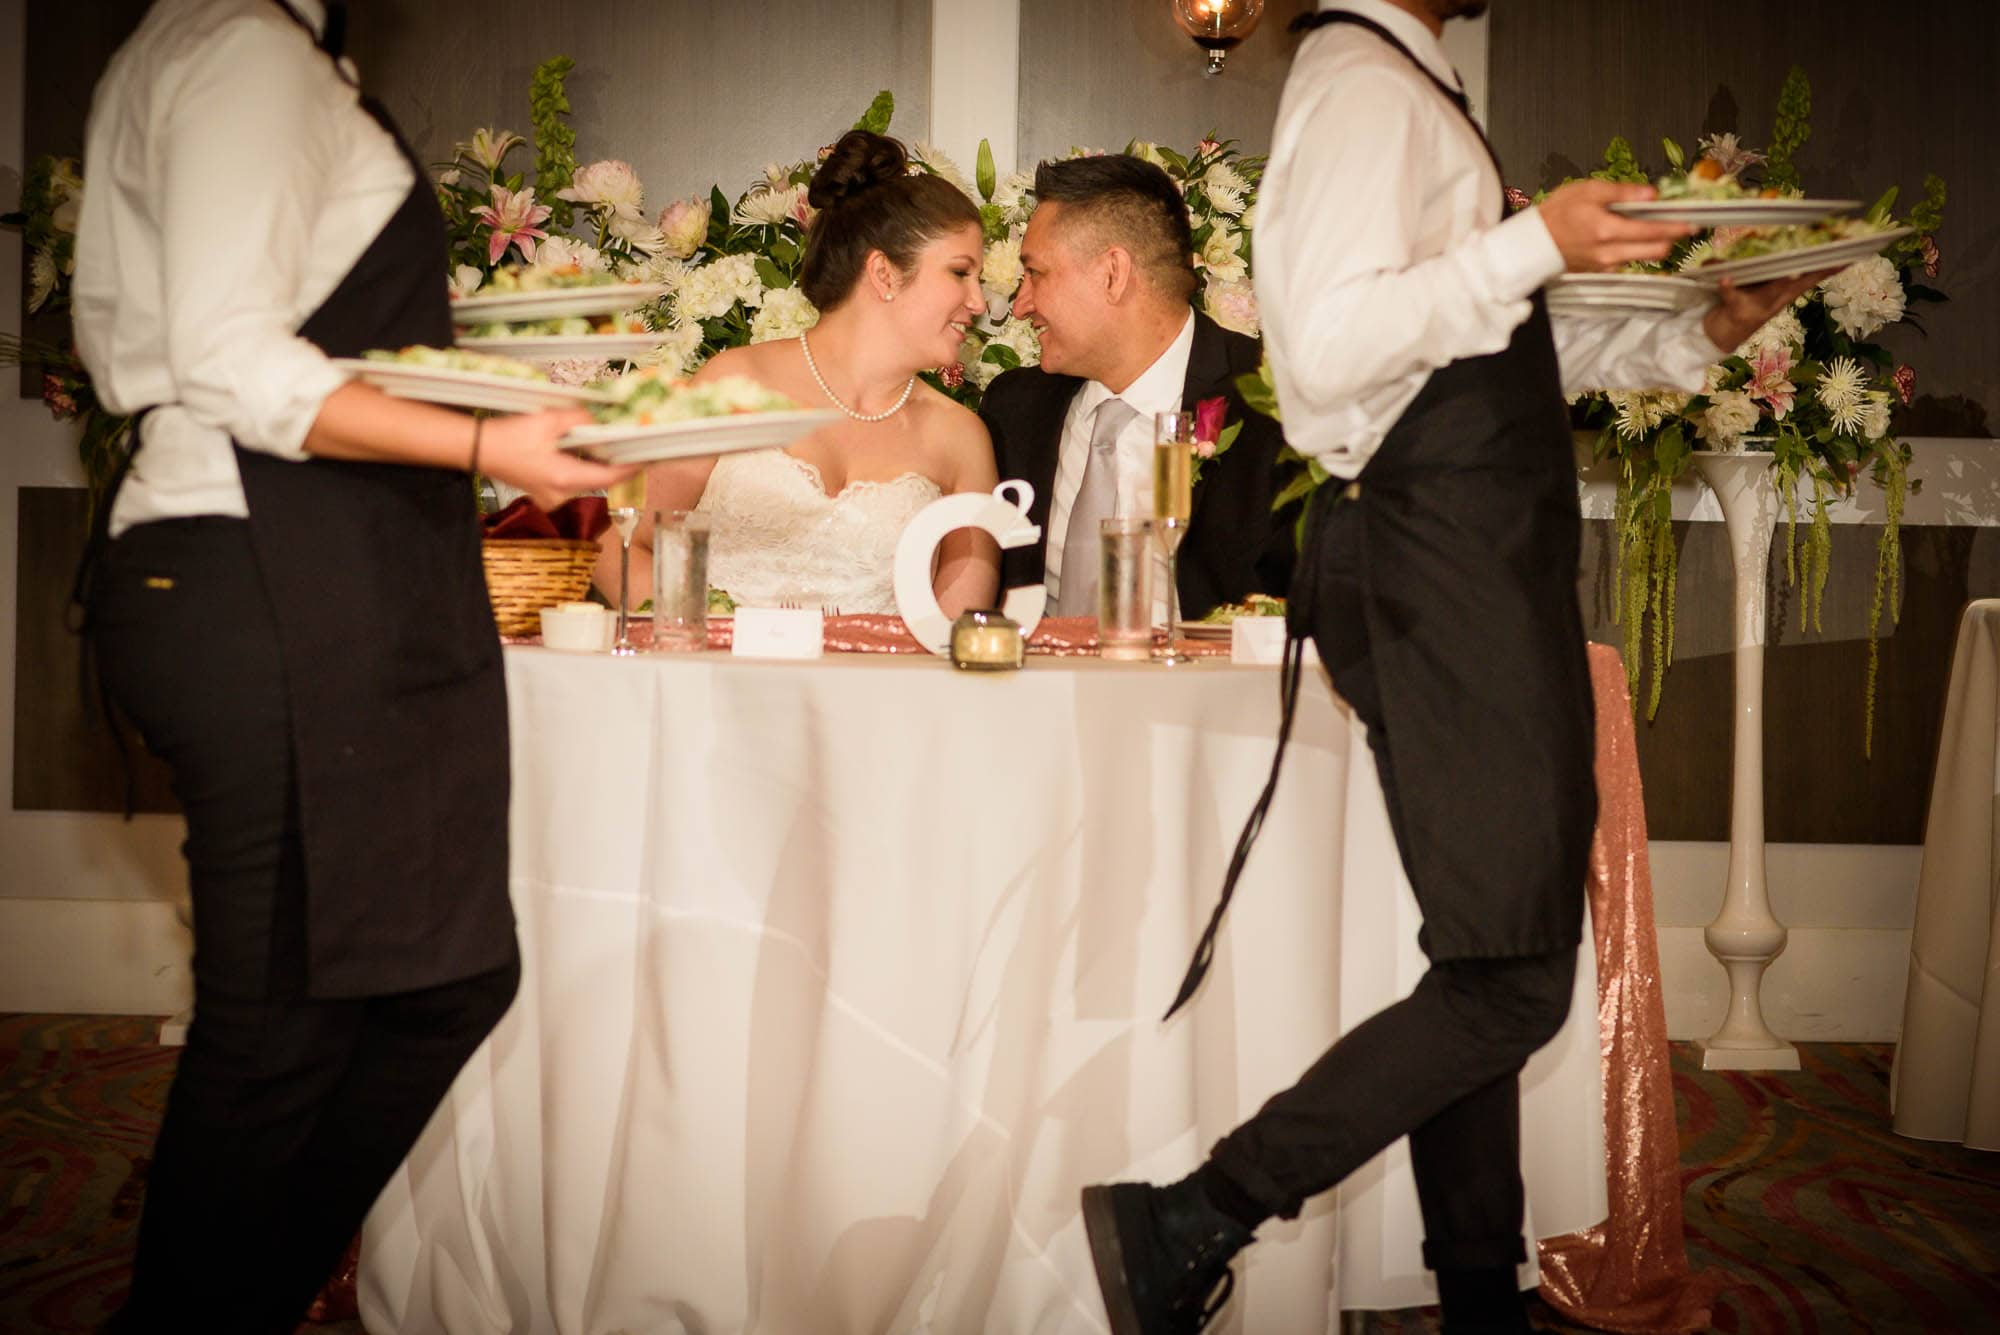 030_Alan_and_Heidi_Wedding_Nicole_Roman